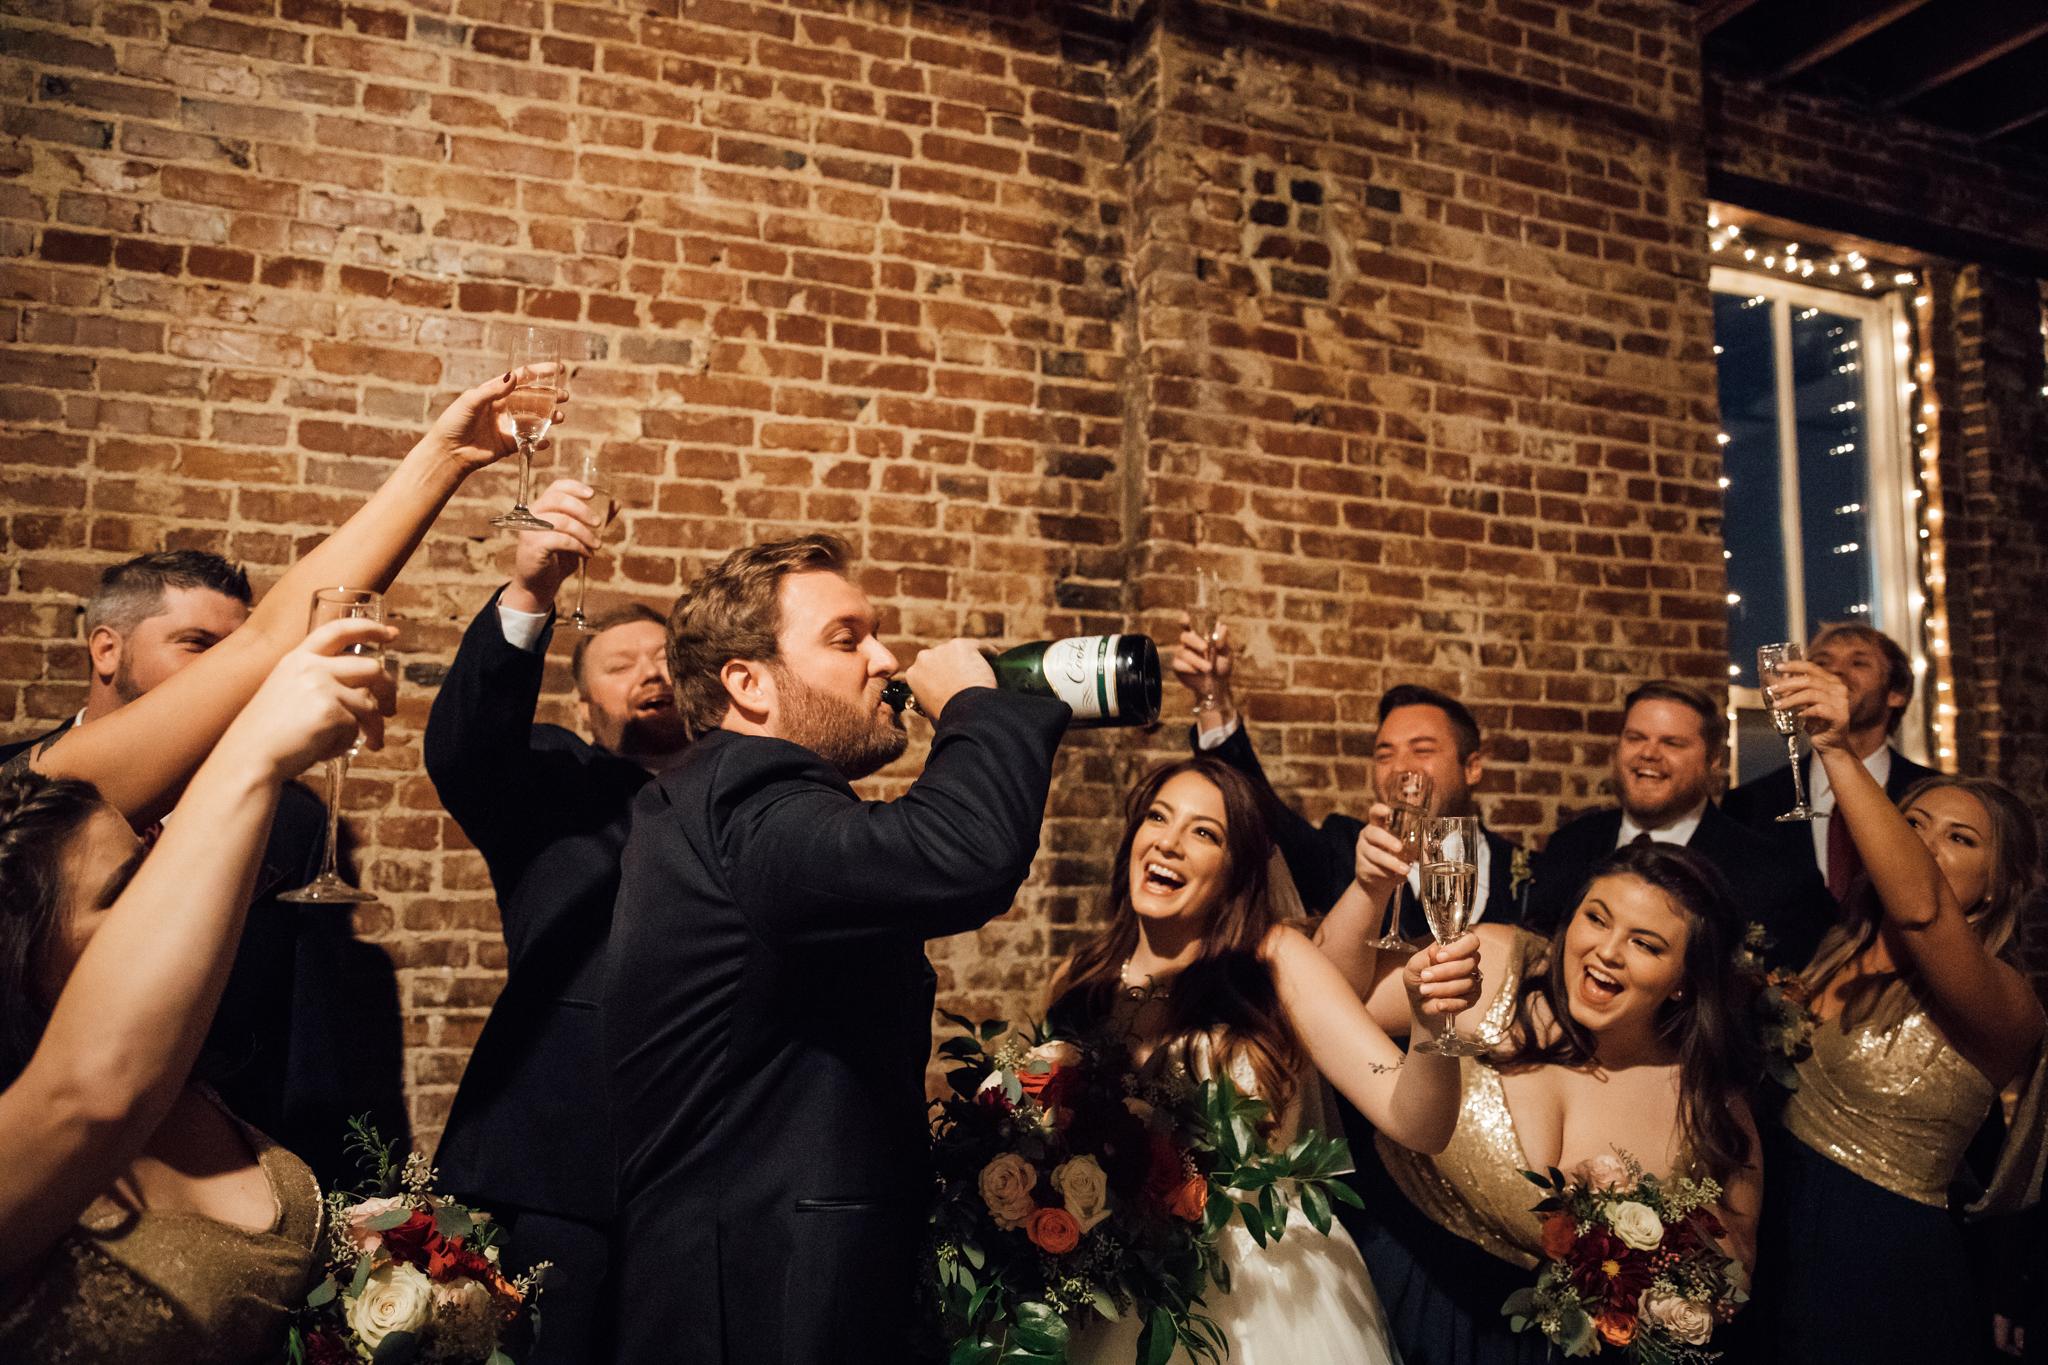 memphis-wedding-photographers-thewarmtharoundyou-ballinese-ballroom (116 of 232).jpg